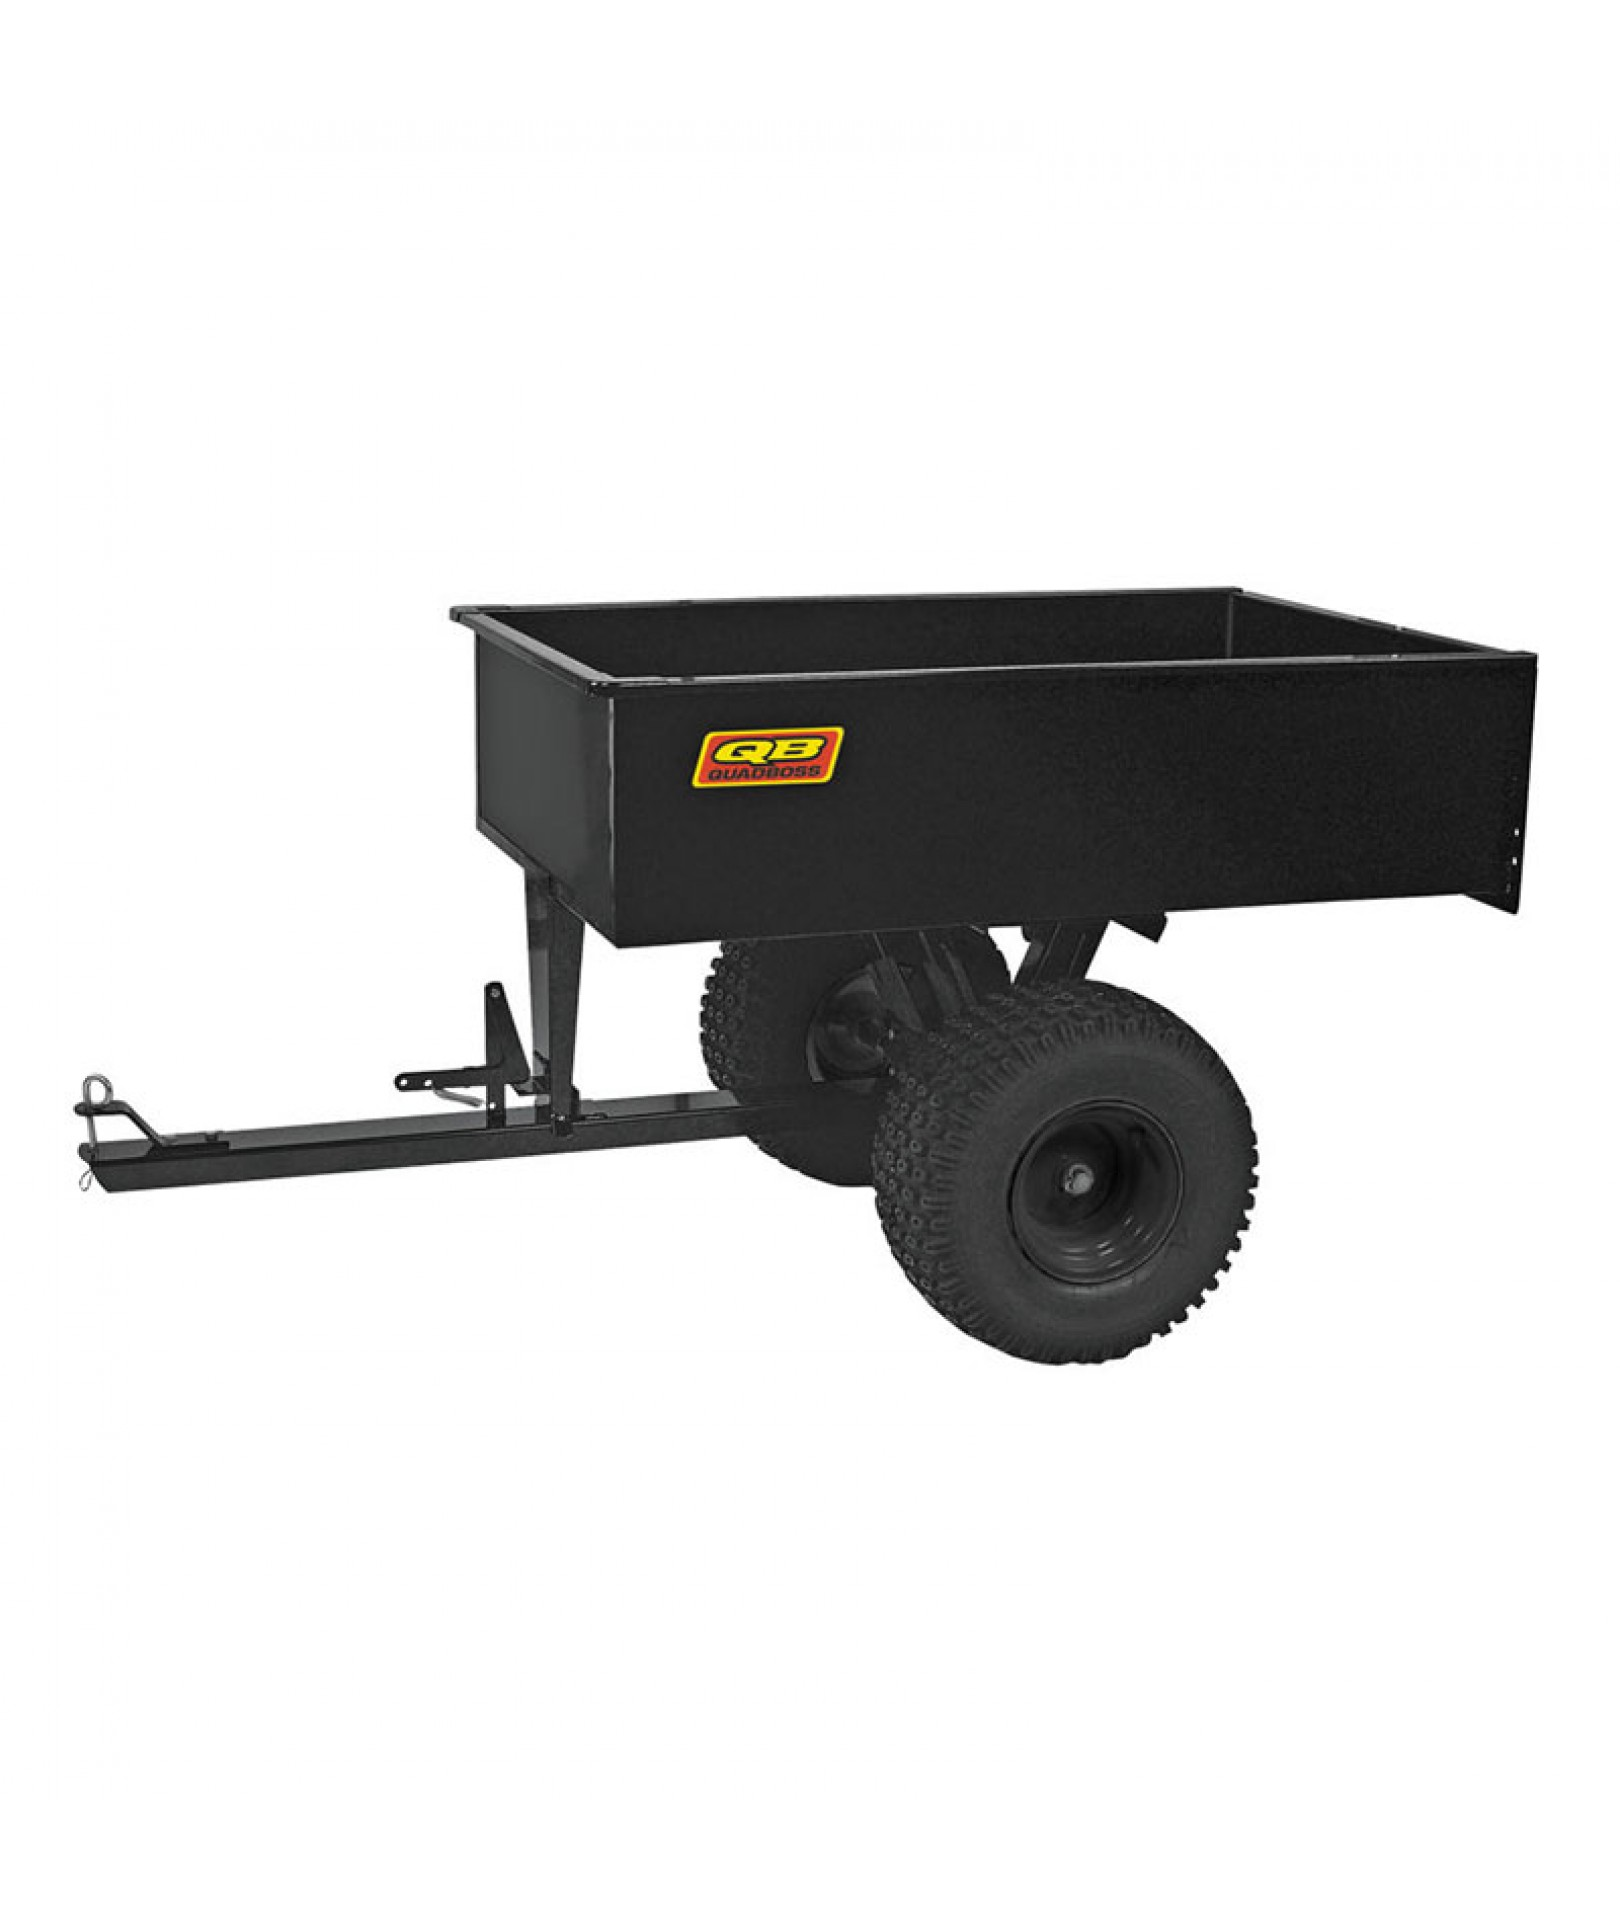 Heavy Duty Tractor Trailer : Heavy duty dump trailer trailers carts equipment